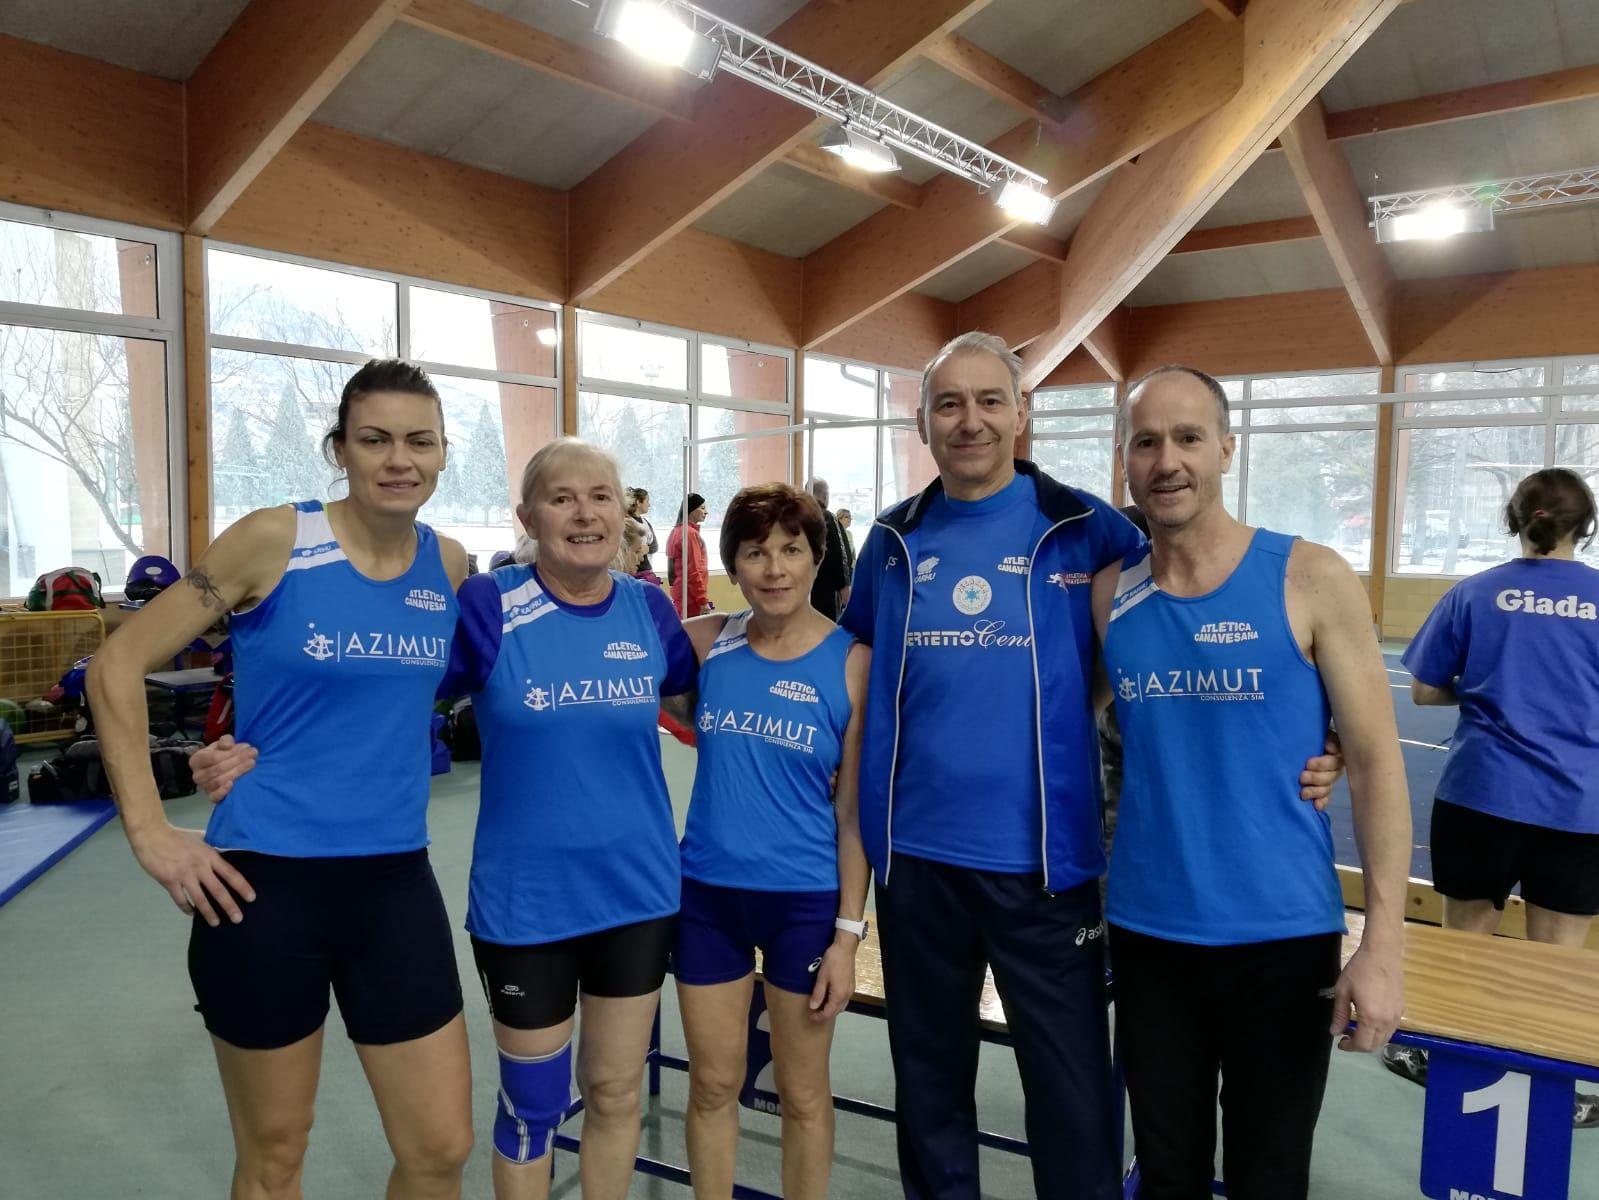 ATLETICA LEGGERA - Canavesane seconde ai campionati piemontesi di staffette